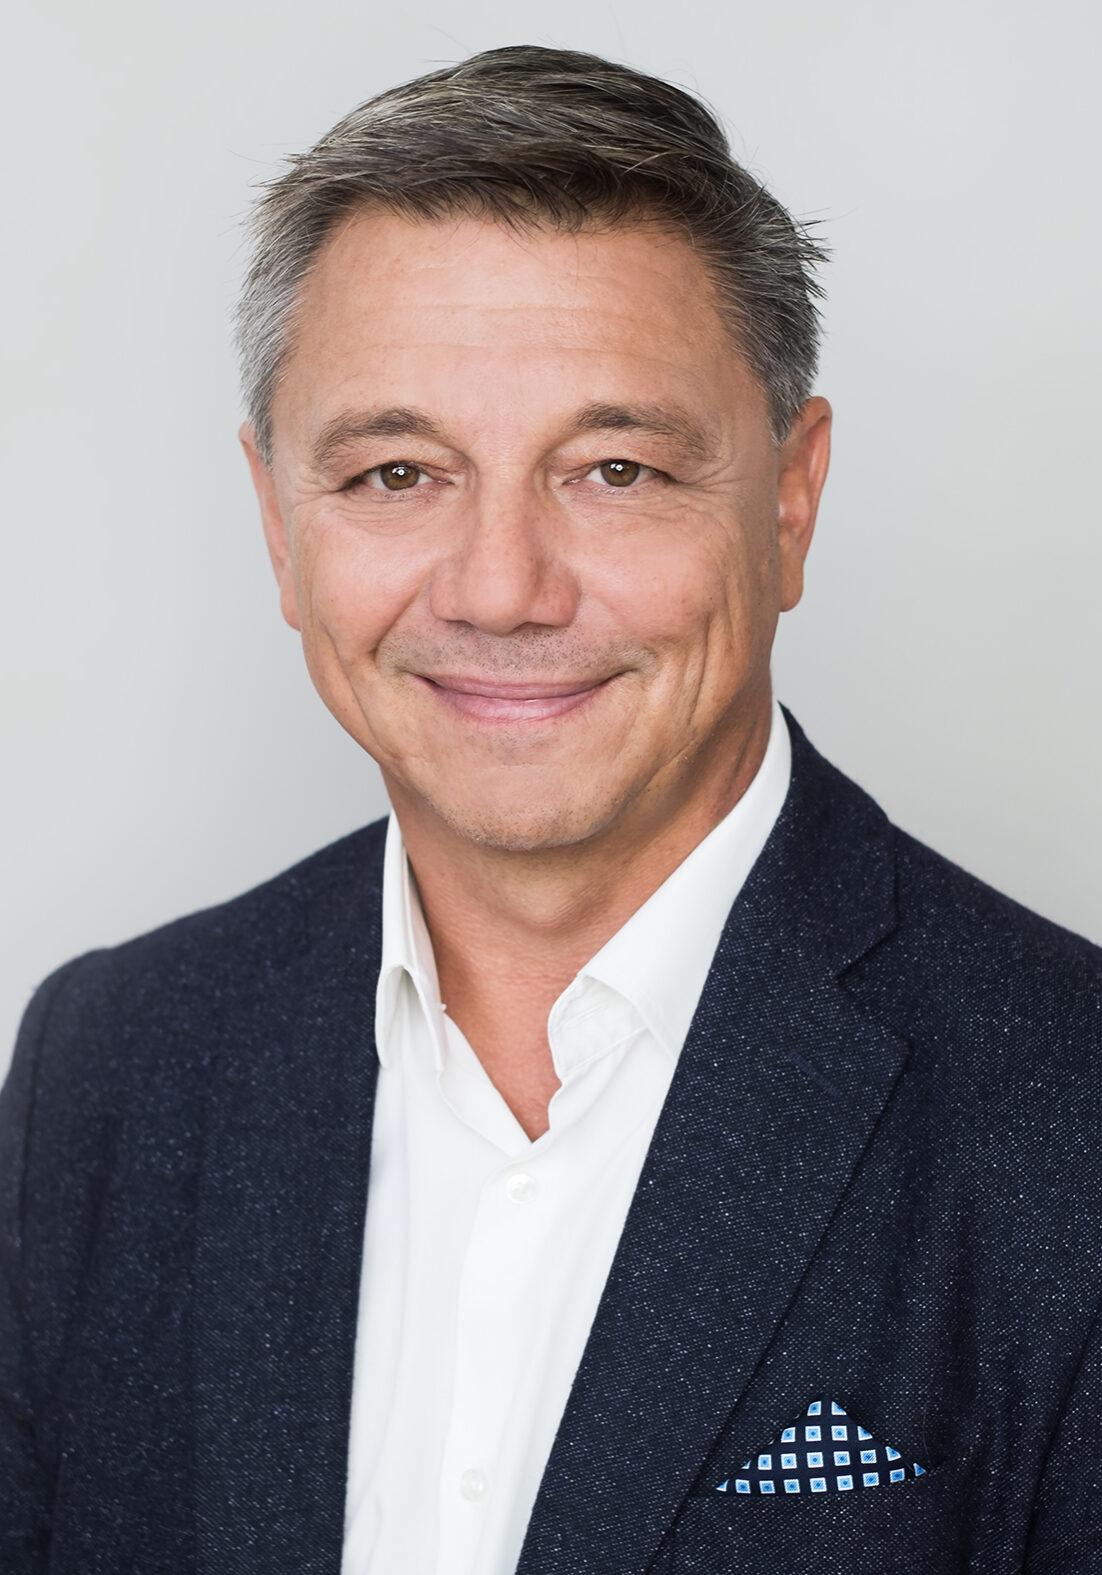 Rainer Grob